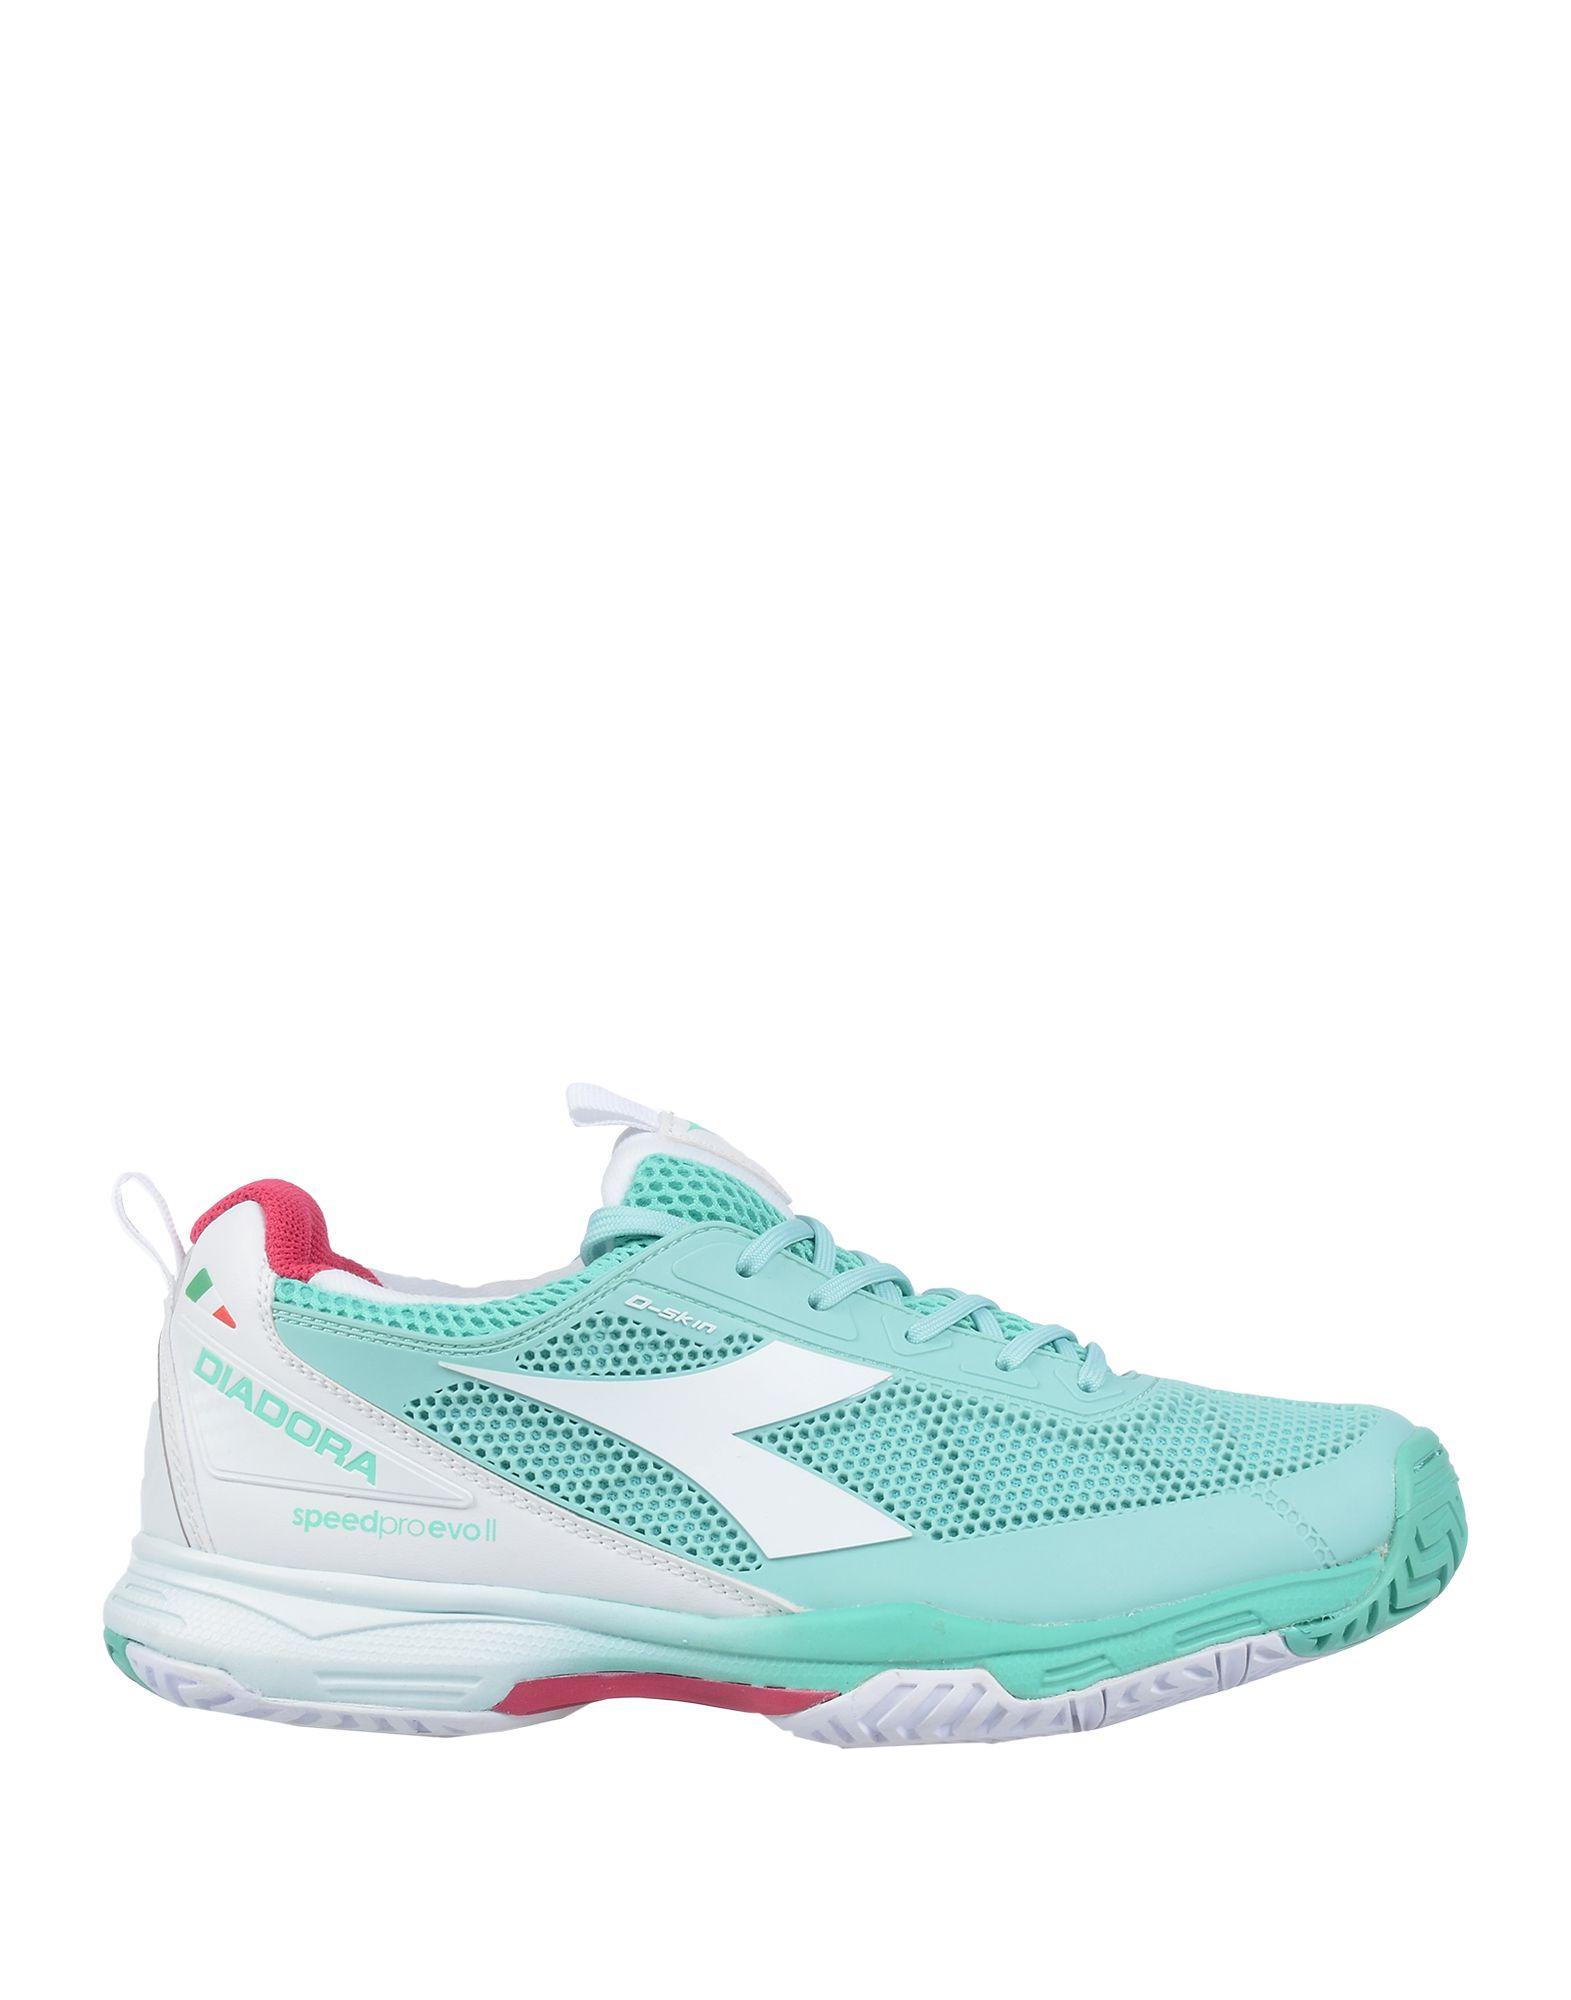 Diadora Sneakers Sneakers Sneakers - Women Diadora Sneakers online on  United Kingdom - 11566987JU d56d63